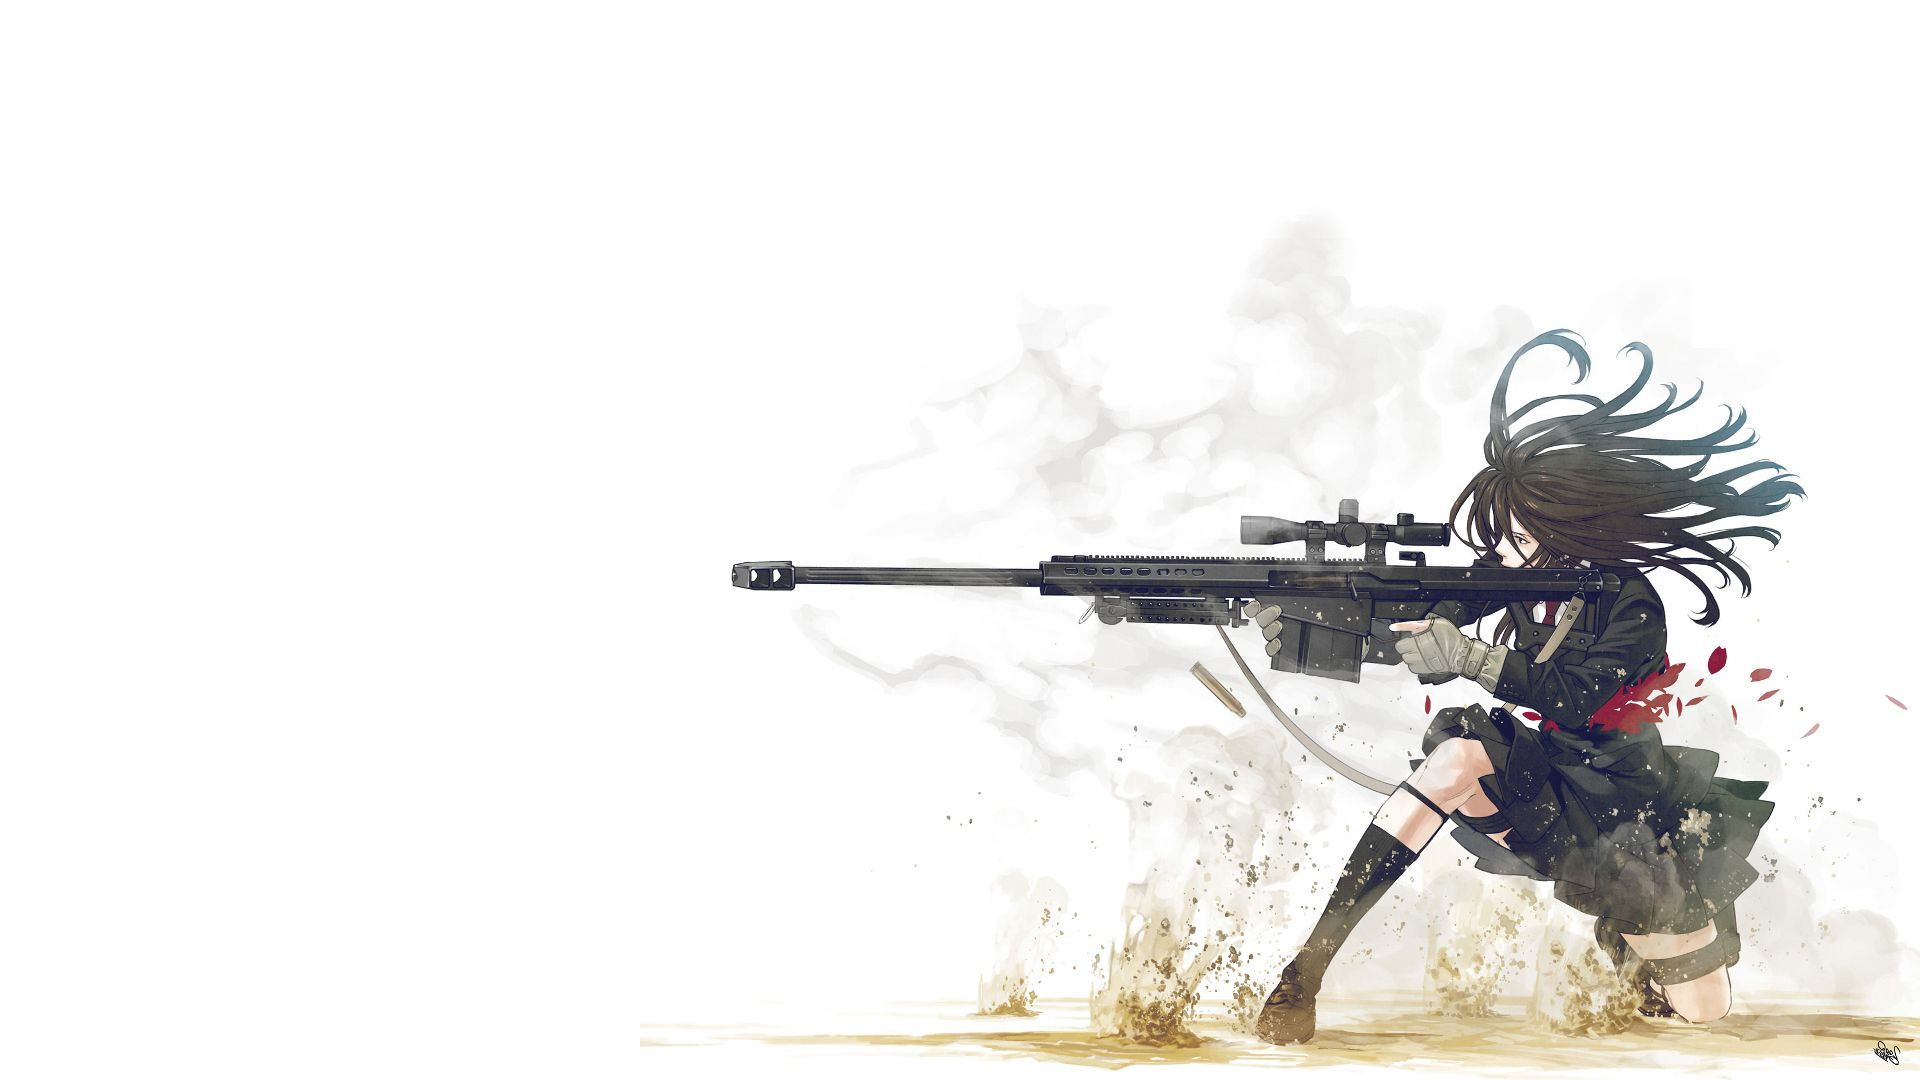 Anime Girl With Gun Hd Wallpaper X Girl